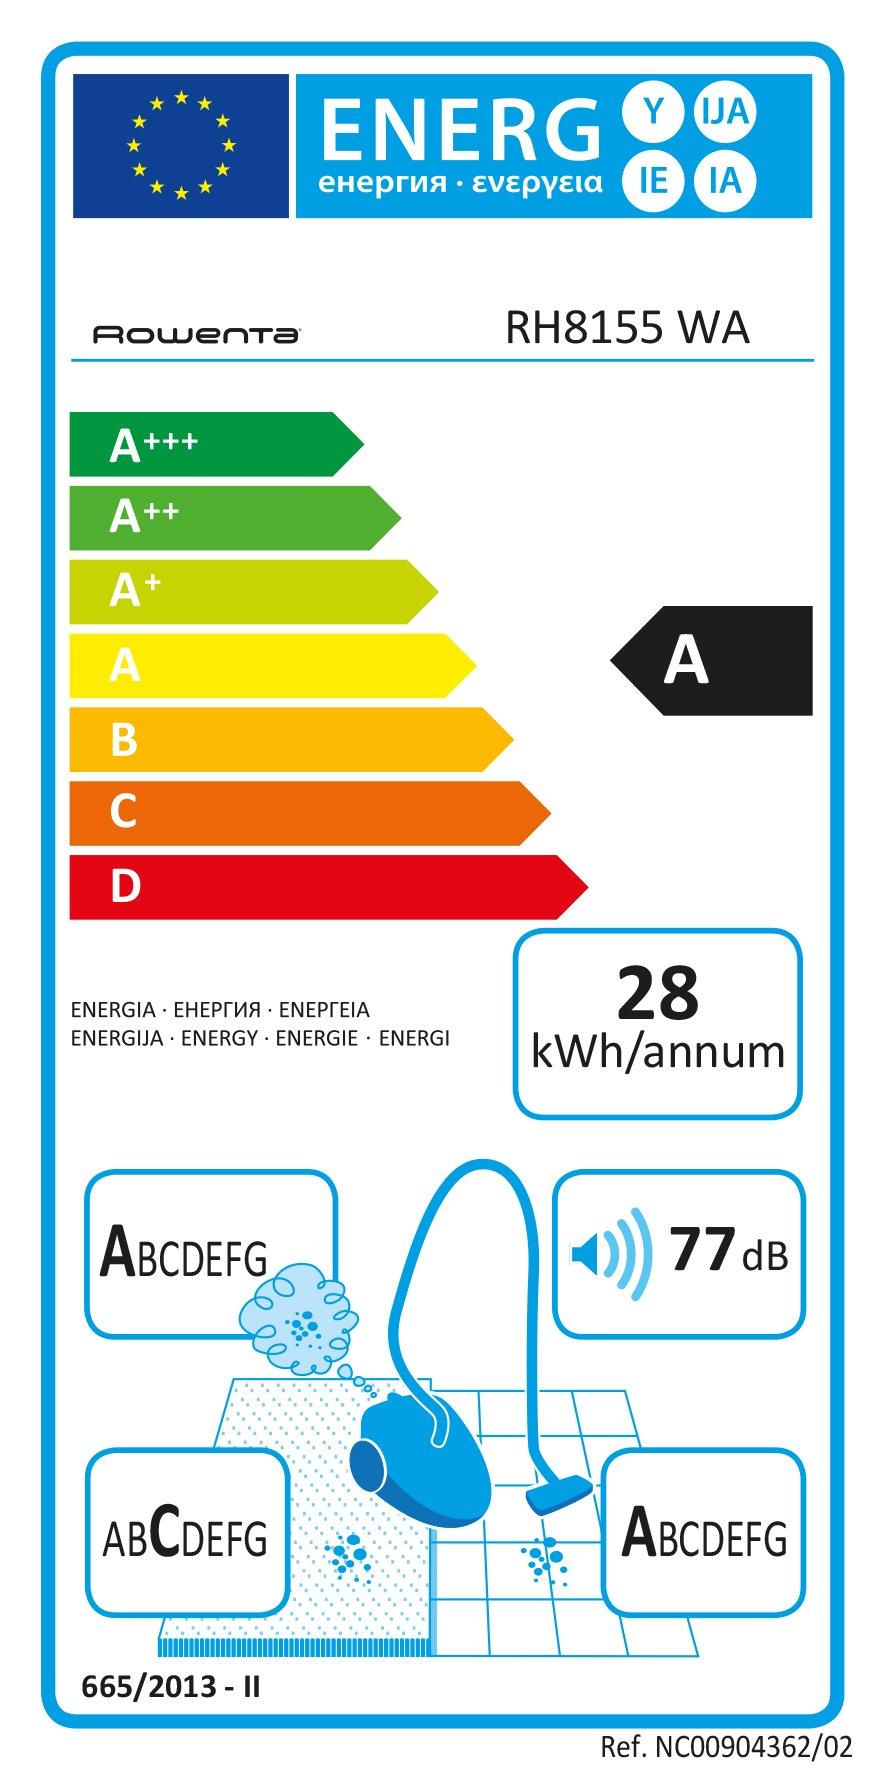 Rowenta RH8155 Powerline Extreme Cyclonic, Scopa Elettrica con Filo e Senza Sacco, Tecnologia Ciclonica, con Kit Animal… 2 spesavip